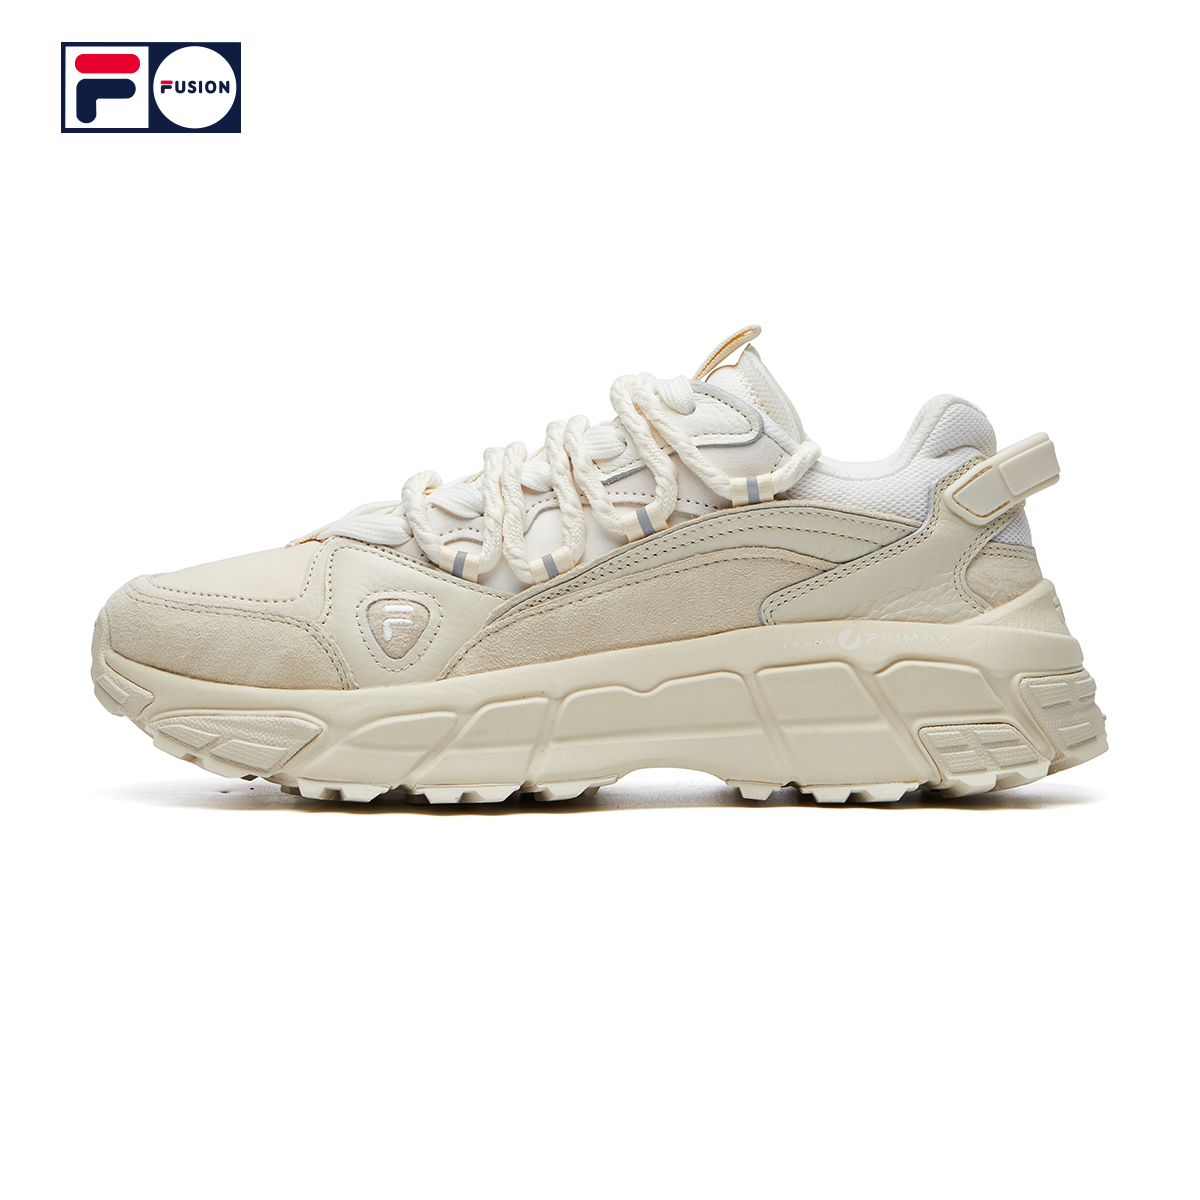 FILA FUSION  แบรนด์ไทด์ SKYRUNNERผู้ชายรองเท้าวิ่ง2021รองเท้ากีฬาฤดูใบไม้ผลิใหม่